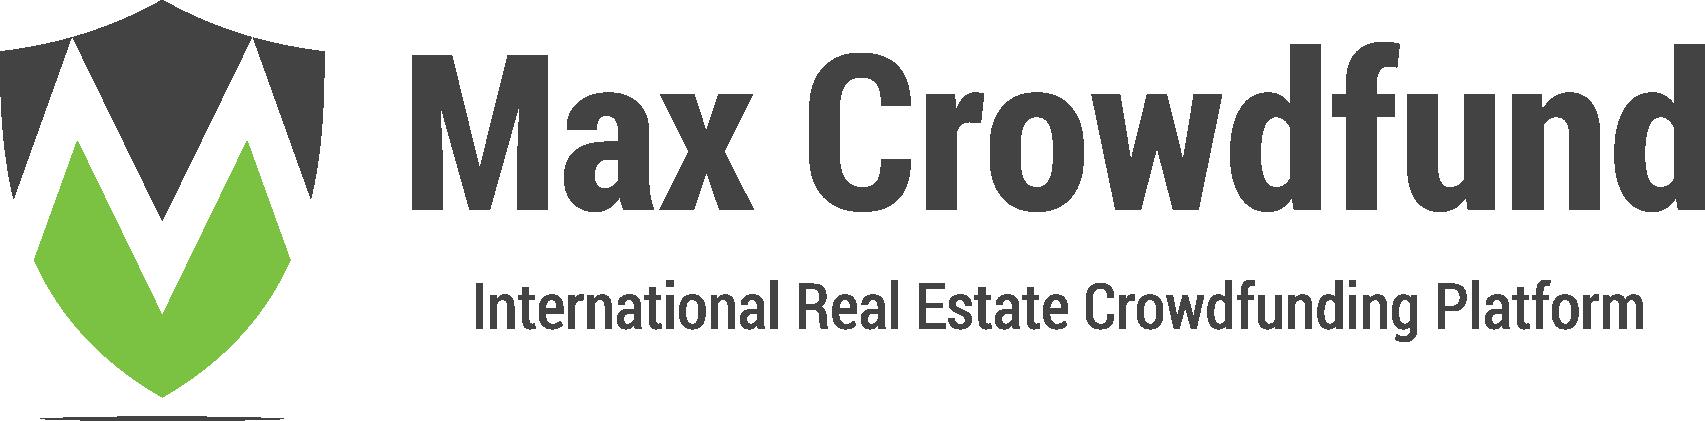 Max Crowdfund B.V. Logo